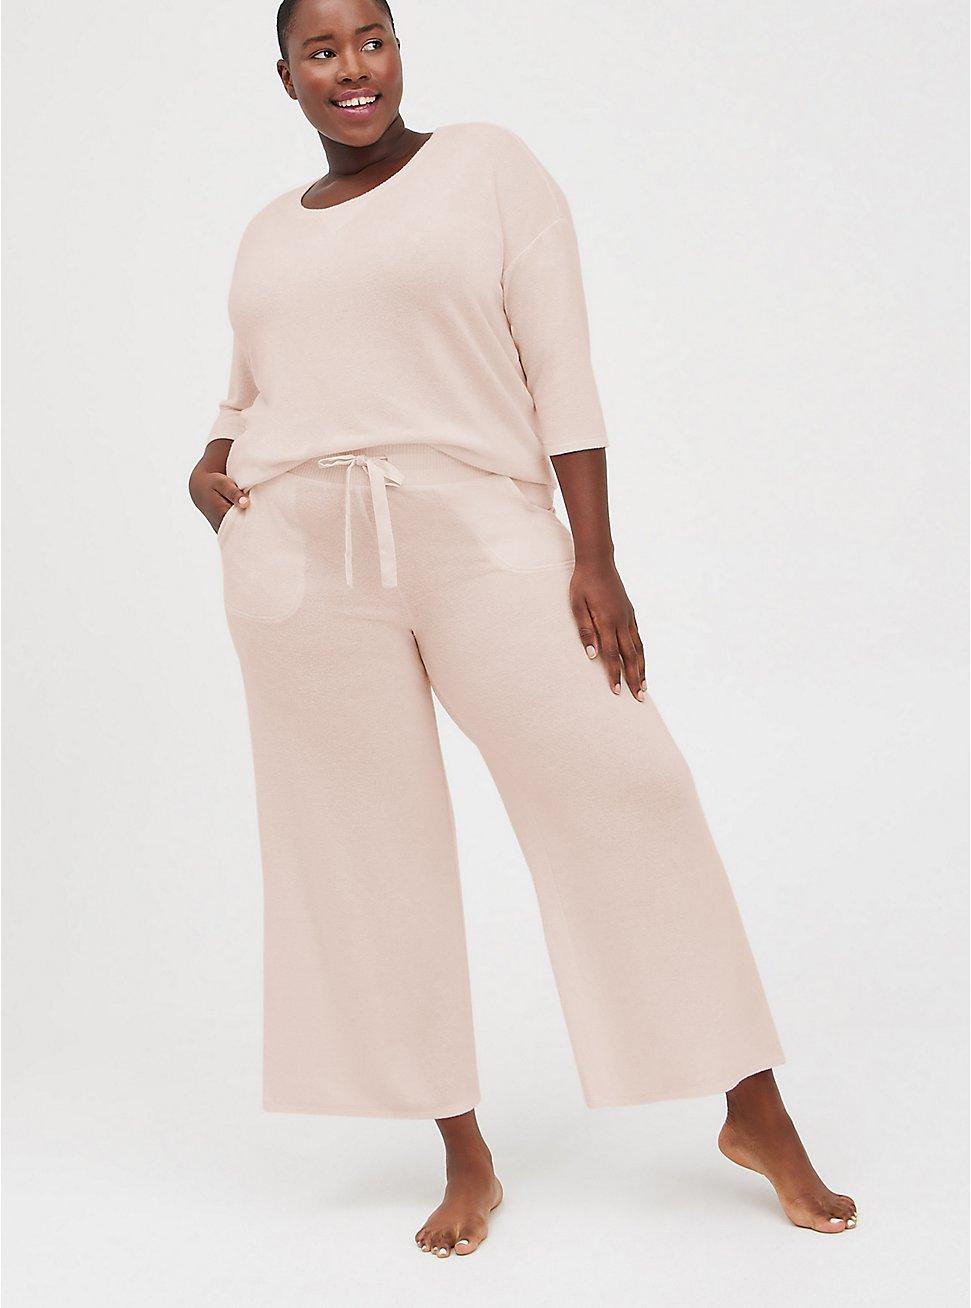 Breast Cancer Awareness Wide Leg Sleep Pant - Super Soft Plush Pink, PINK, hi-res